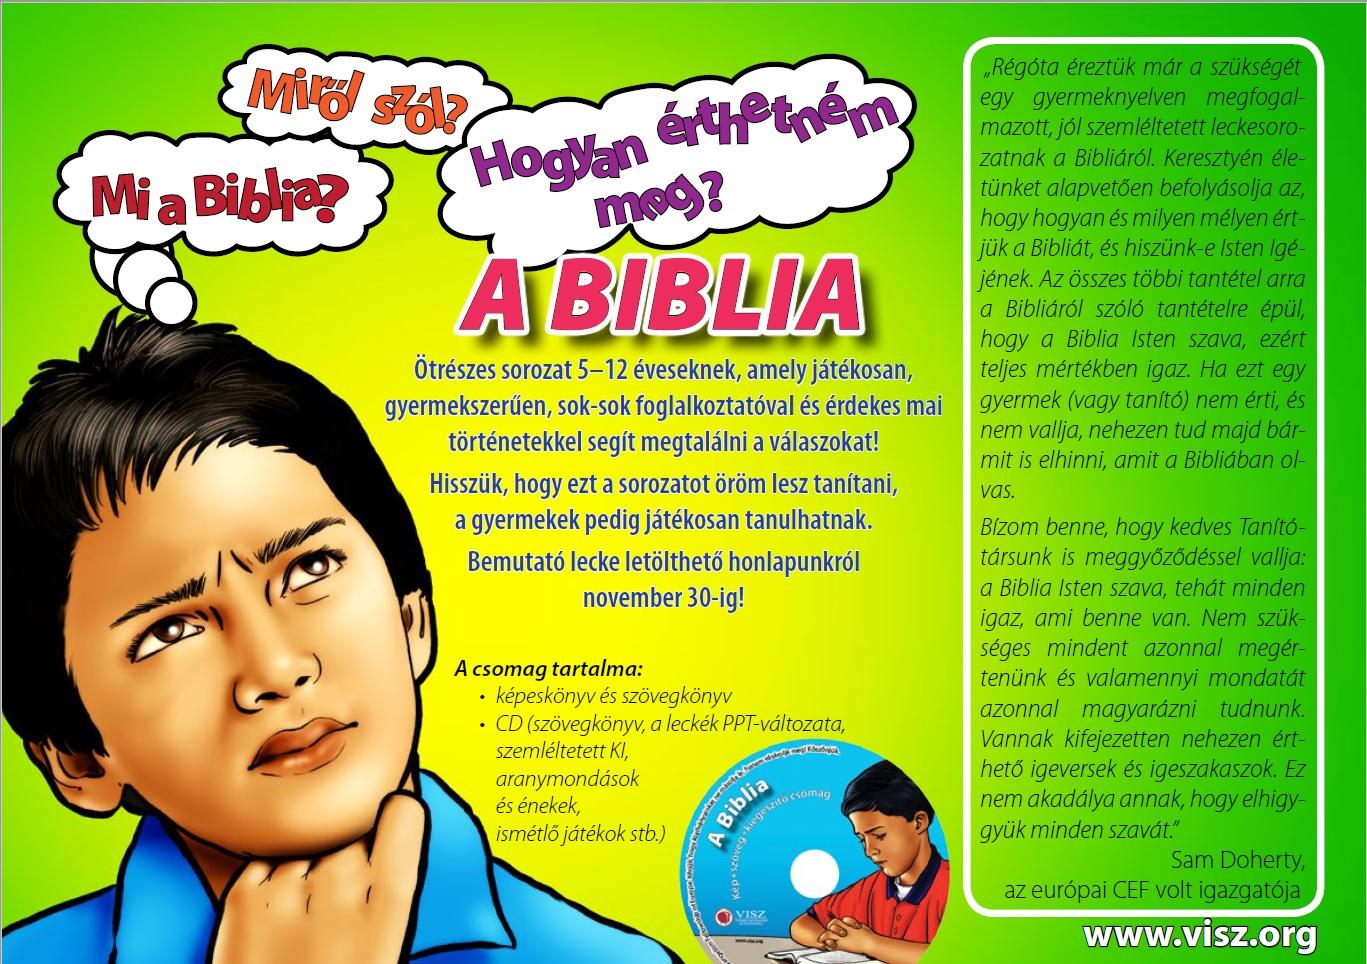 A Biblia reklam